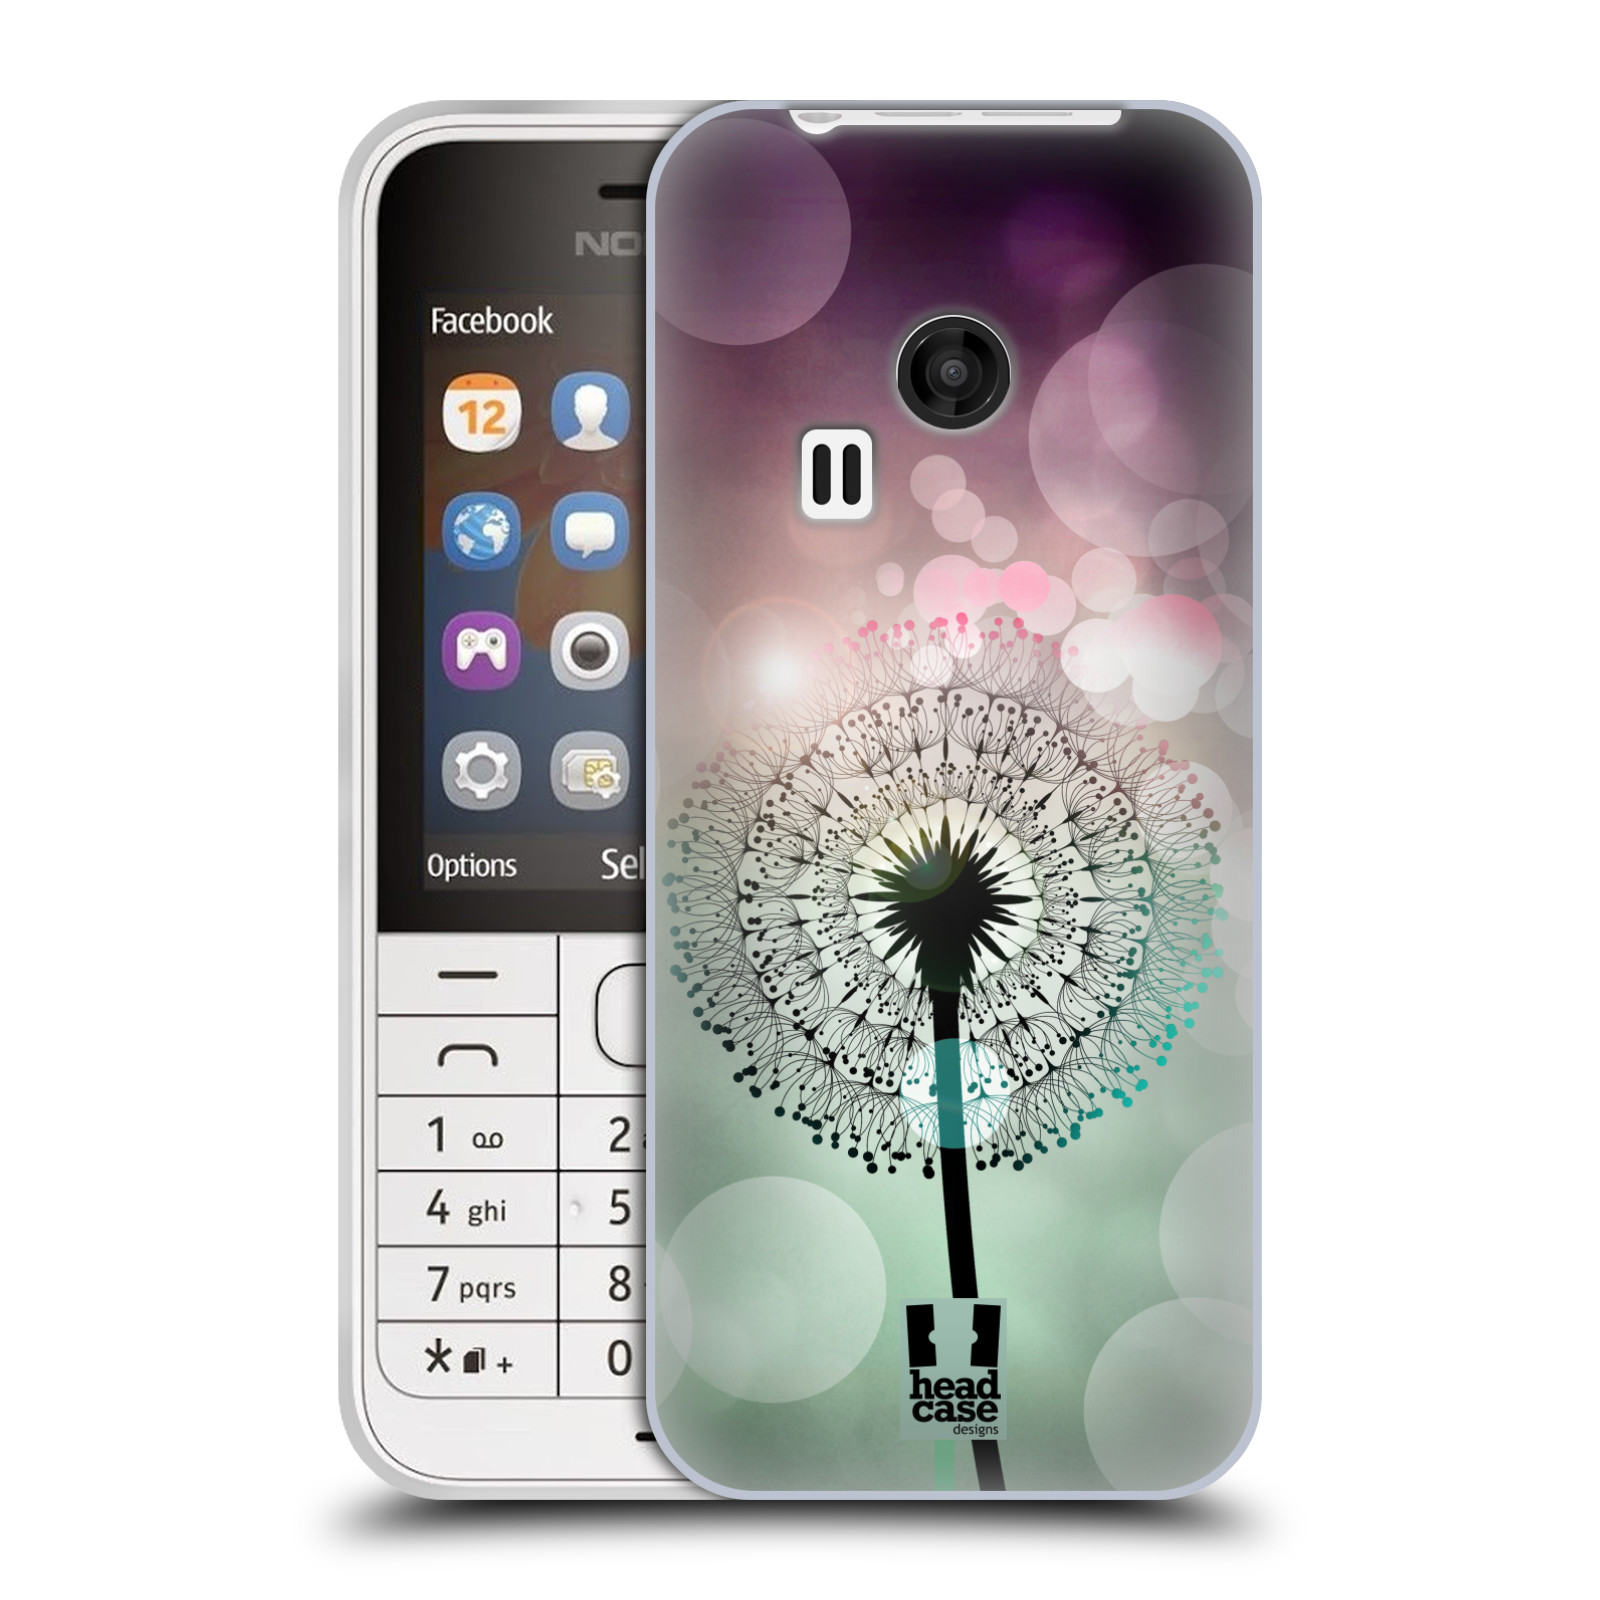 Silikonové pouzdro na mobil Nokia 220 HEAD CASE Pampeliškové odlesky (Silikonový kryt či obal na mobilní telefon Nokia 220 a 220 Dual SIM)